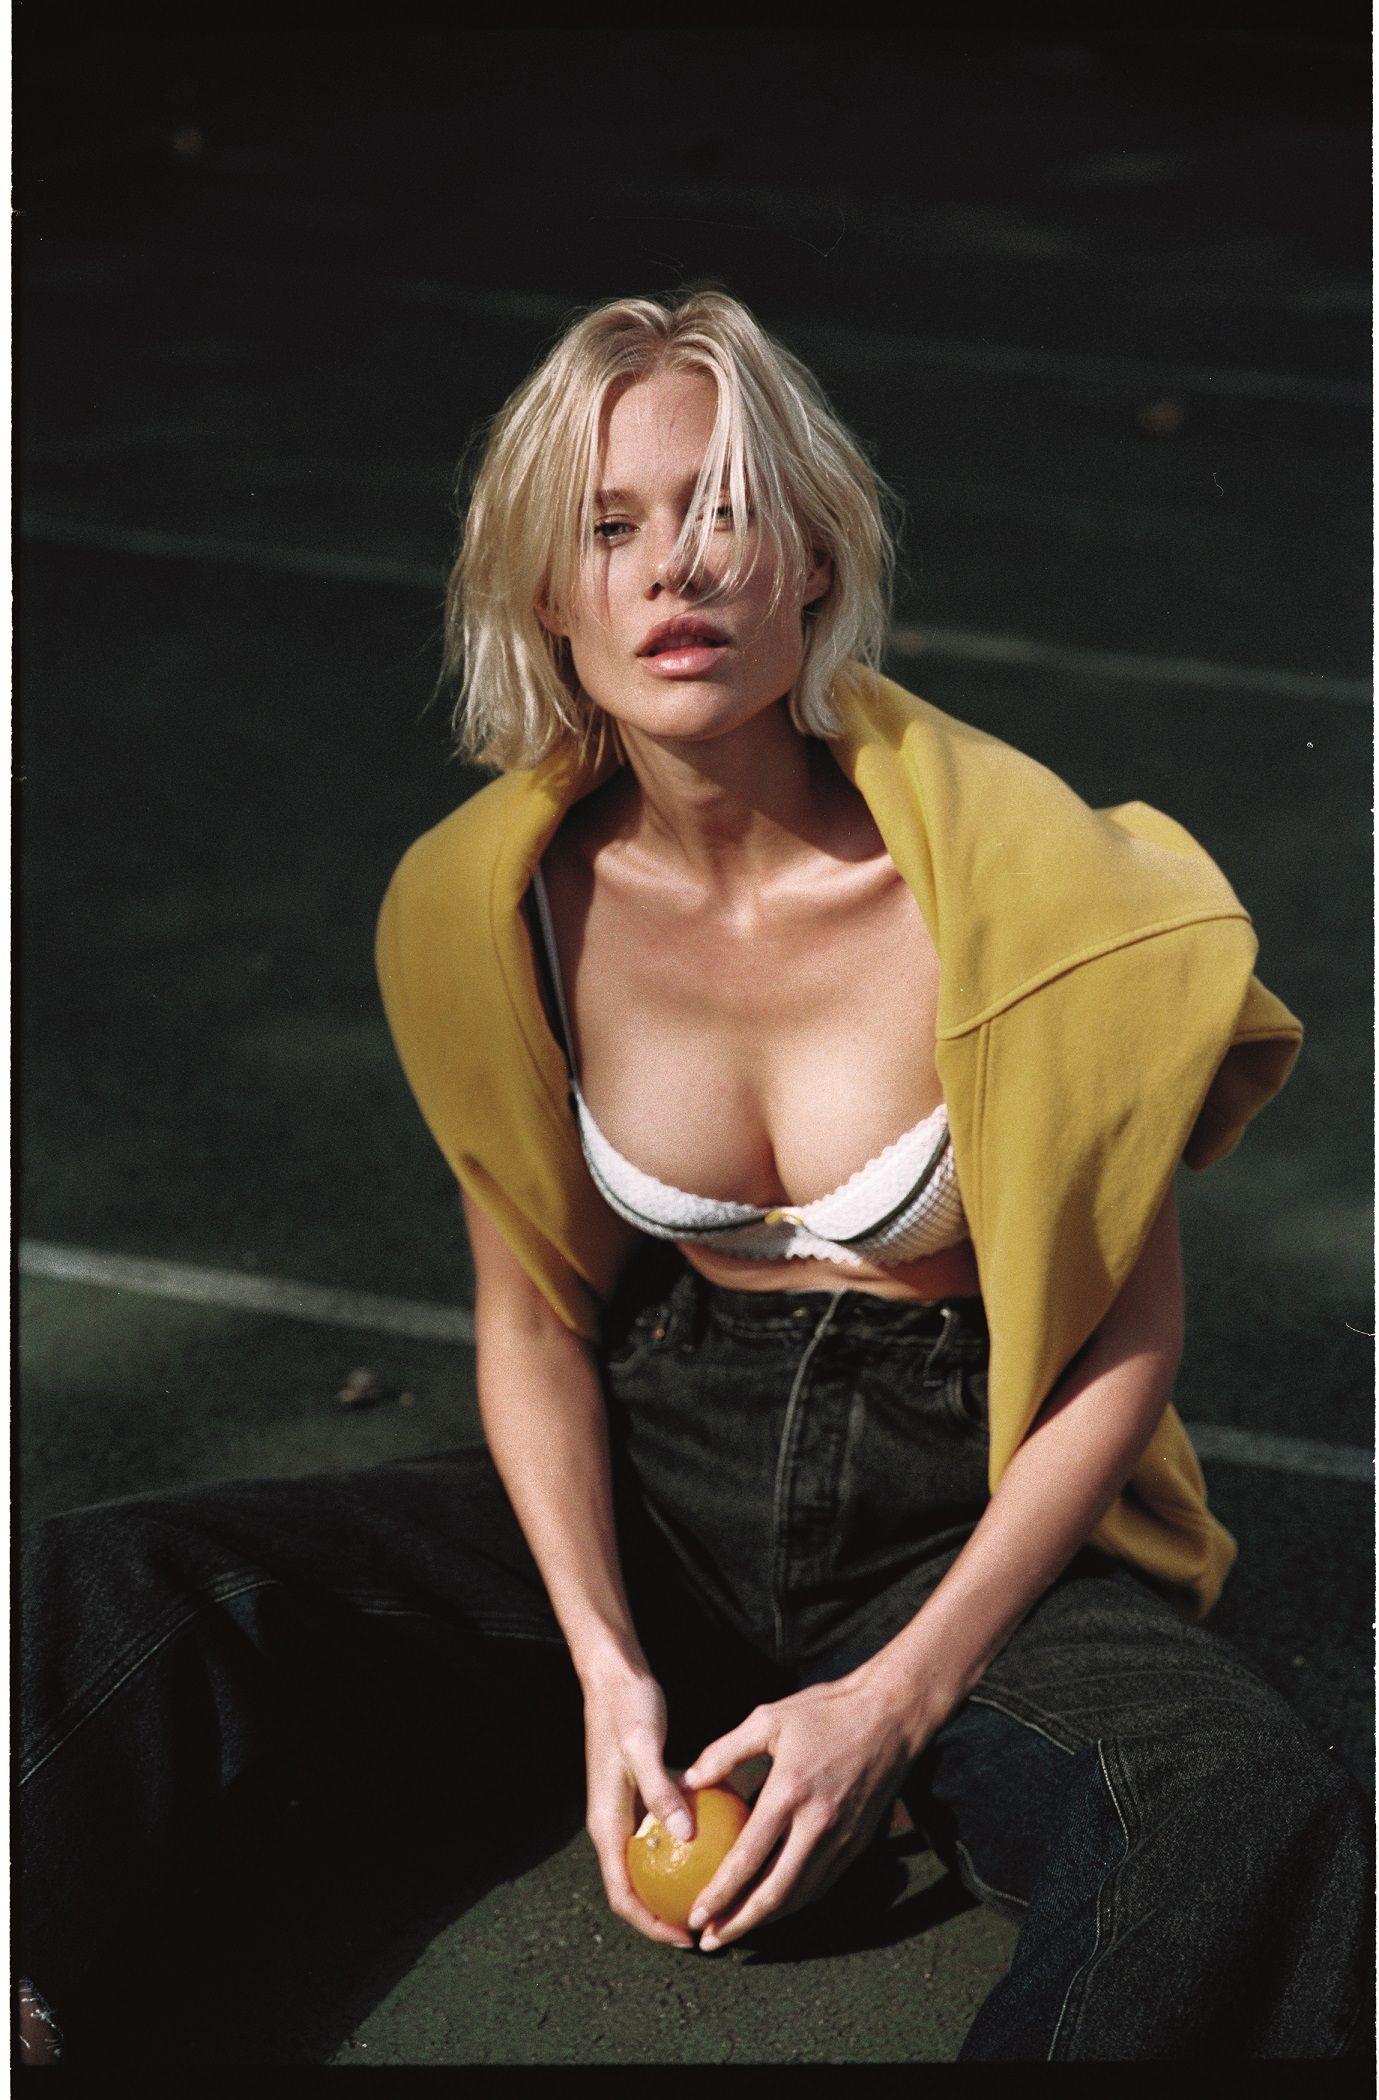 Video Becca Hiller nude photos 2019